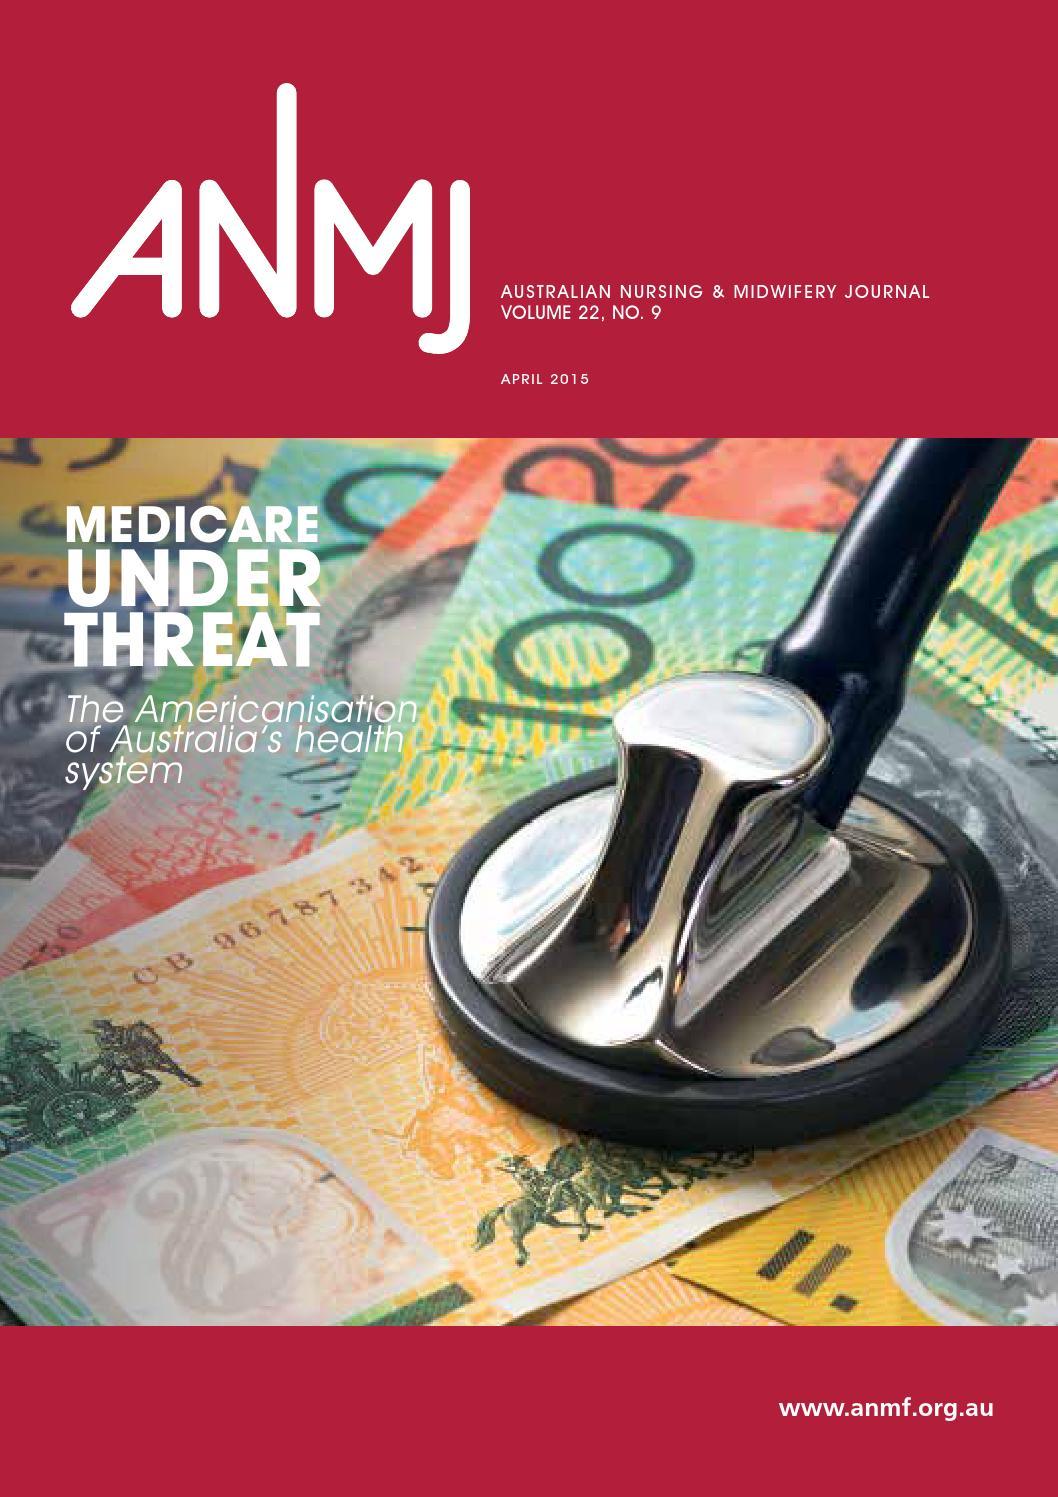 Anmj April 2015 By Australian Nursing Midwifery Journal Issuu Tas Nurse Kit